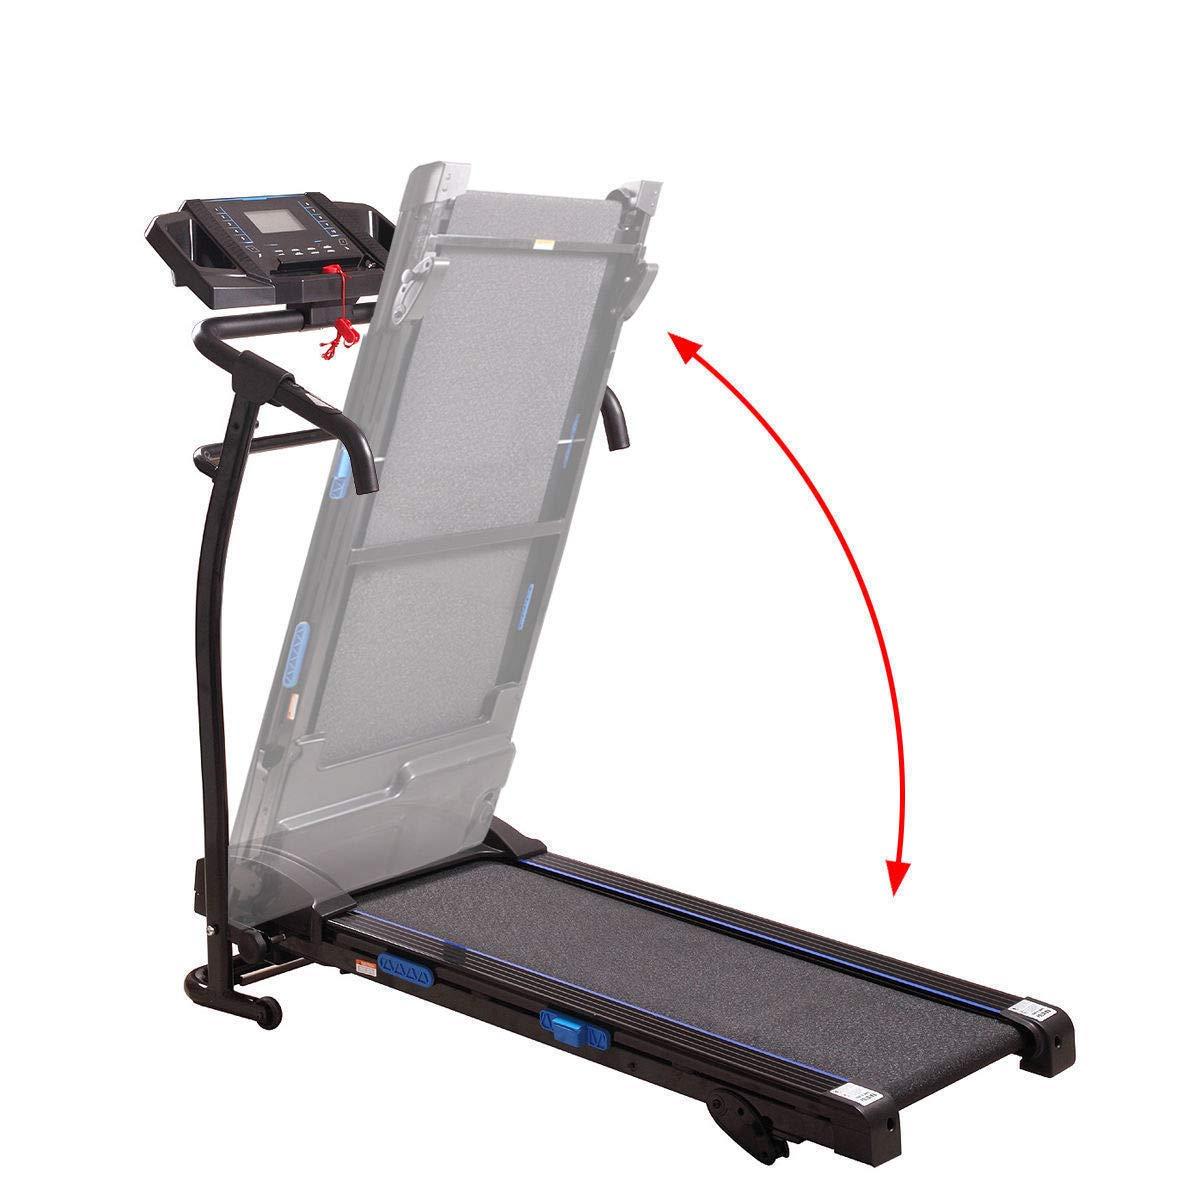 LAZYMOON 1500W Treadmil Running Machine Folding Motorized Home Fitness Machine Black